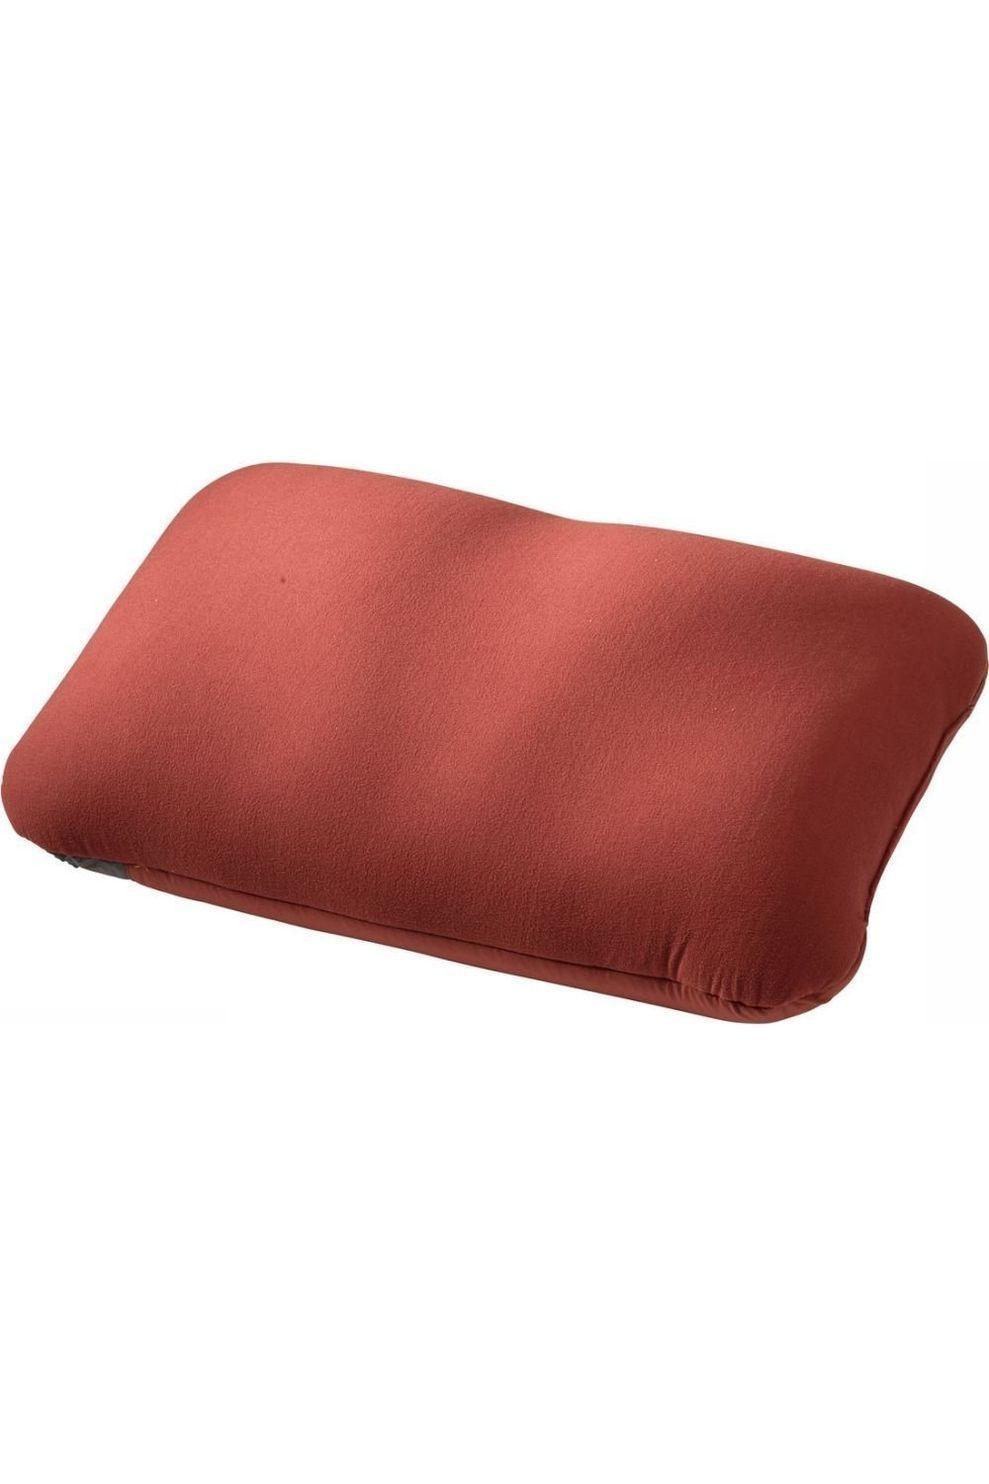 VAUDE Kussen Pillow M - Rood